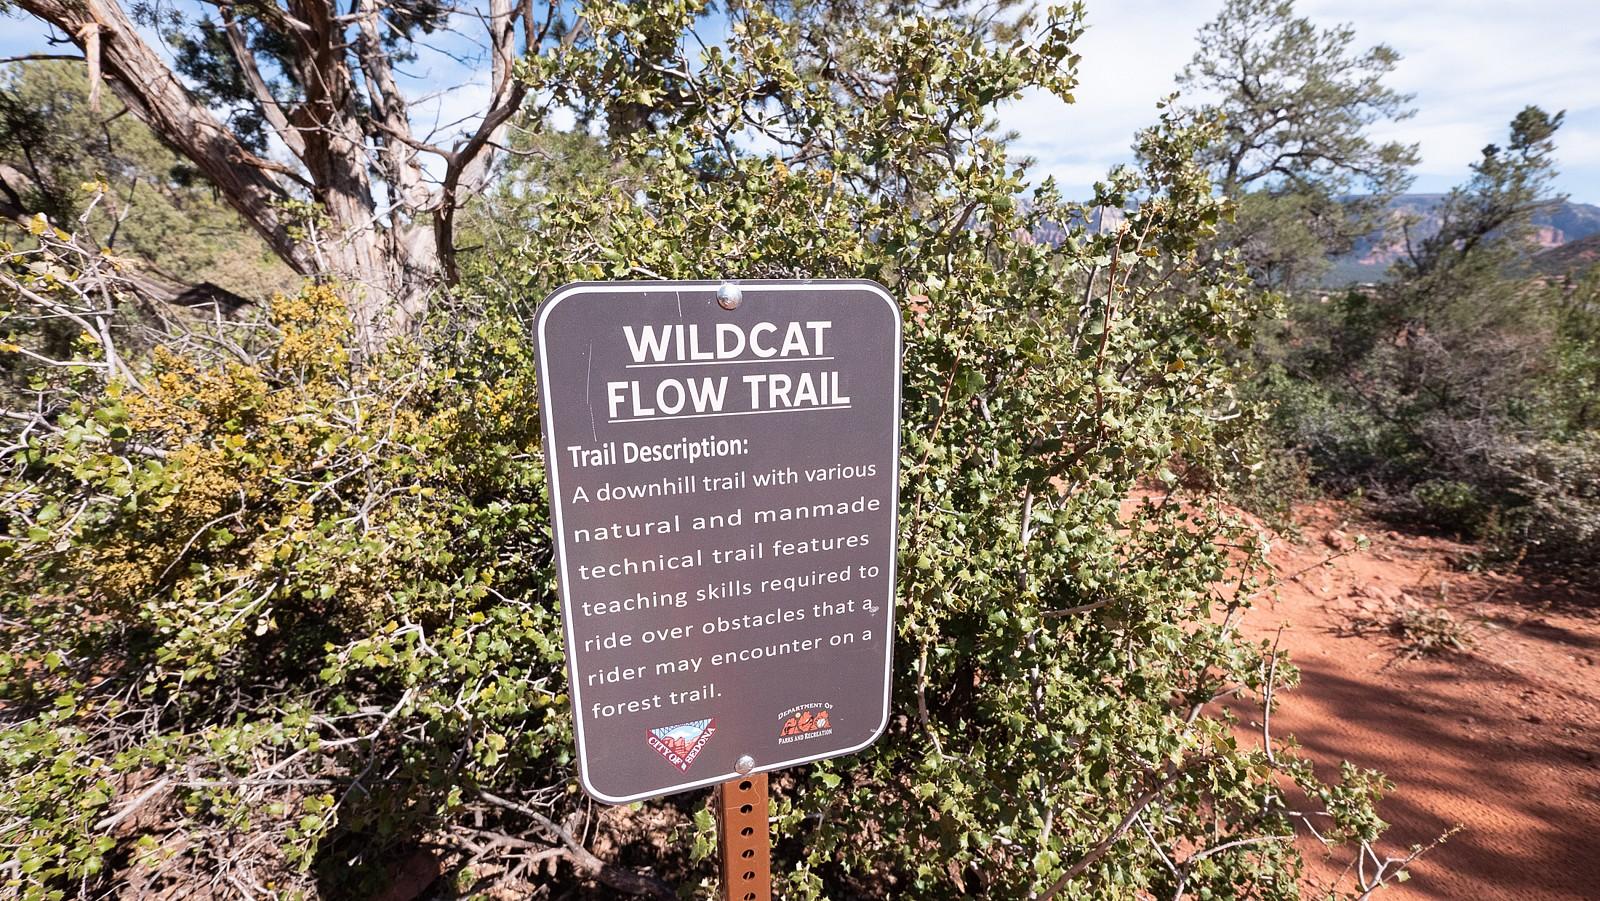 Fresh Flow Trail Goods in Sedona - PIT BITS 2 - Sedona Bike Festival 2020 - Mountain Biking Pictures - Vital MTB